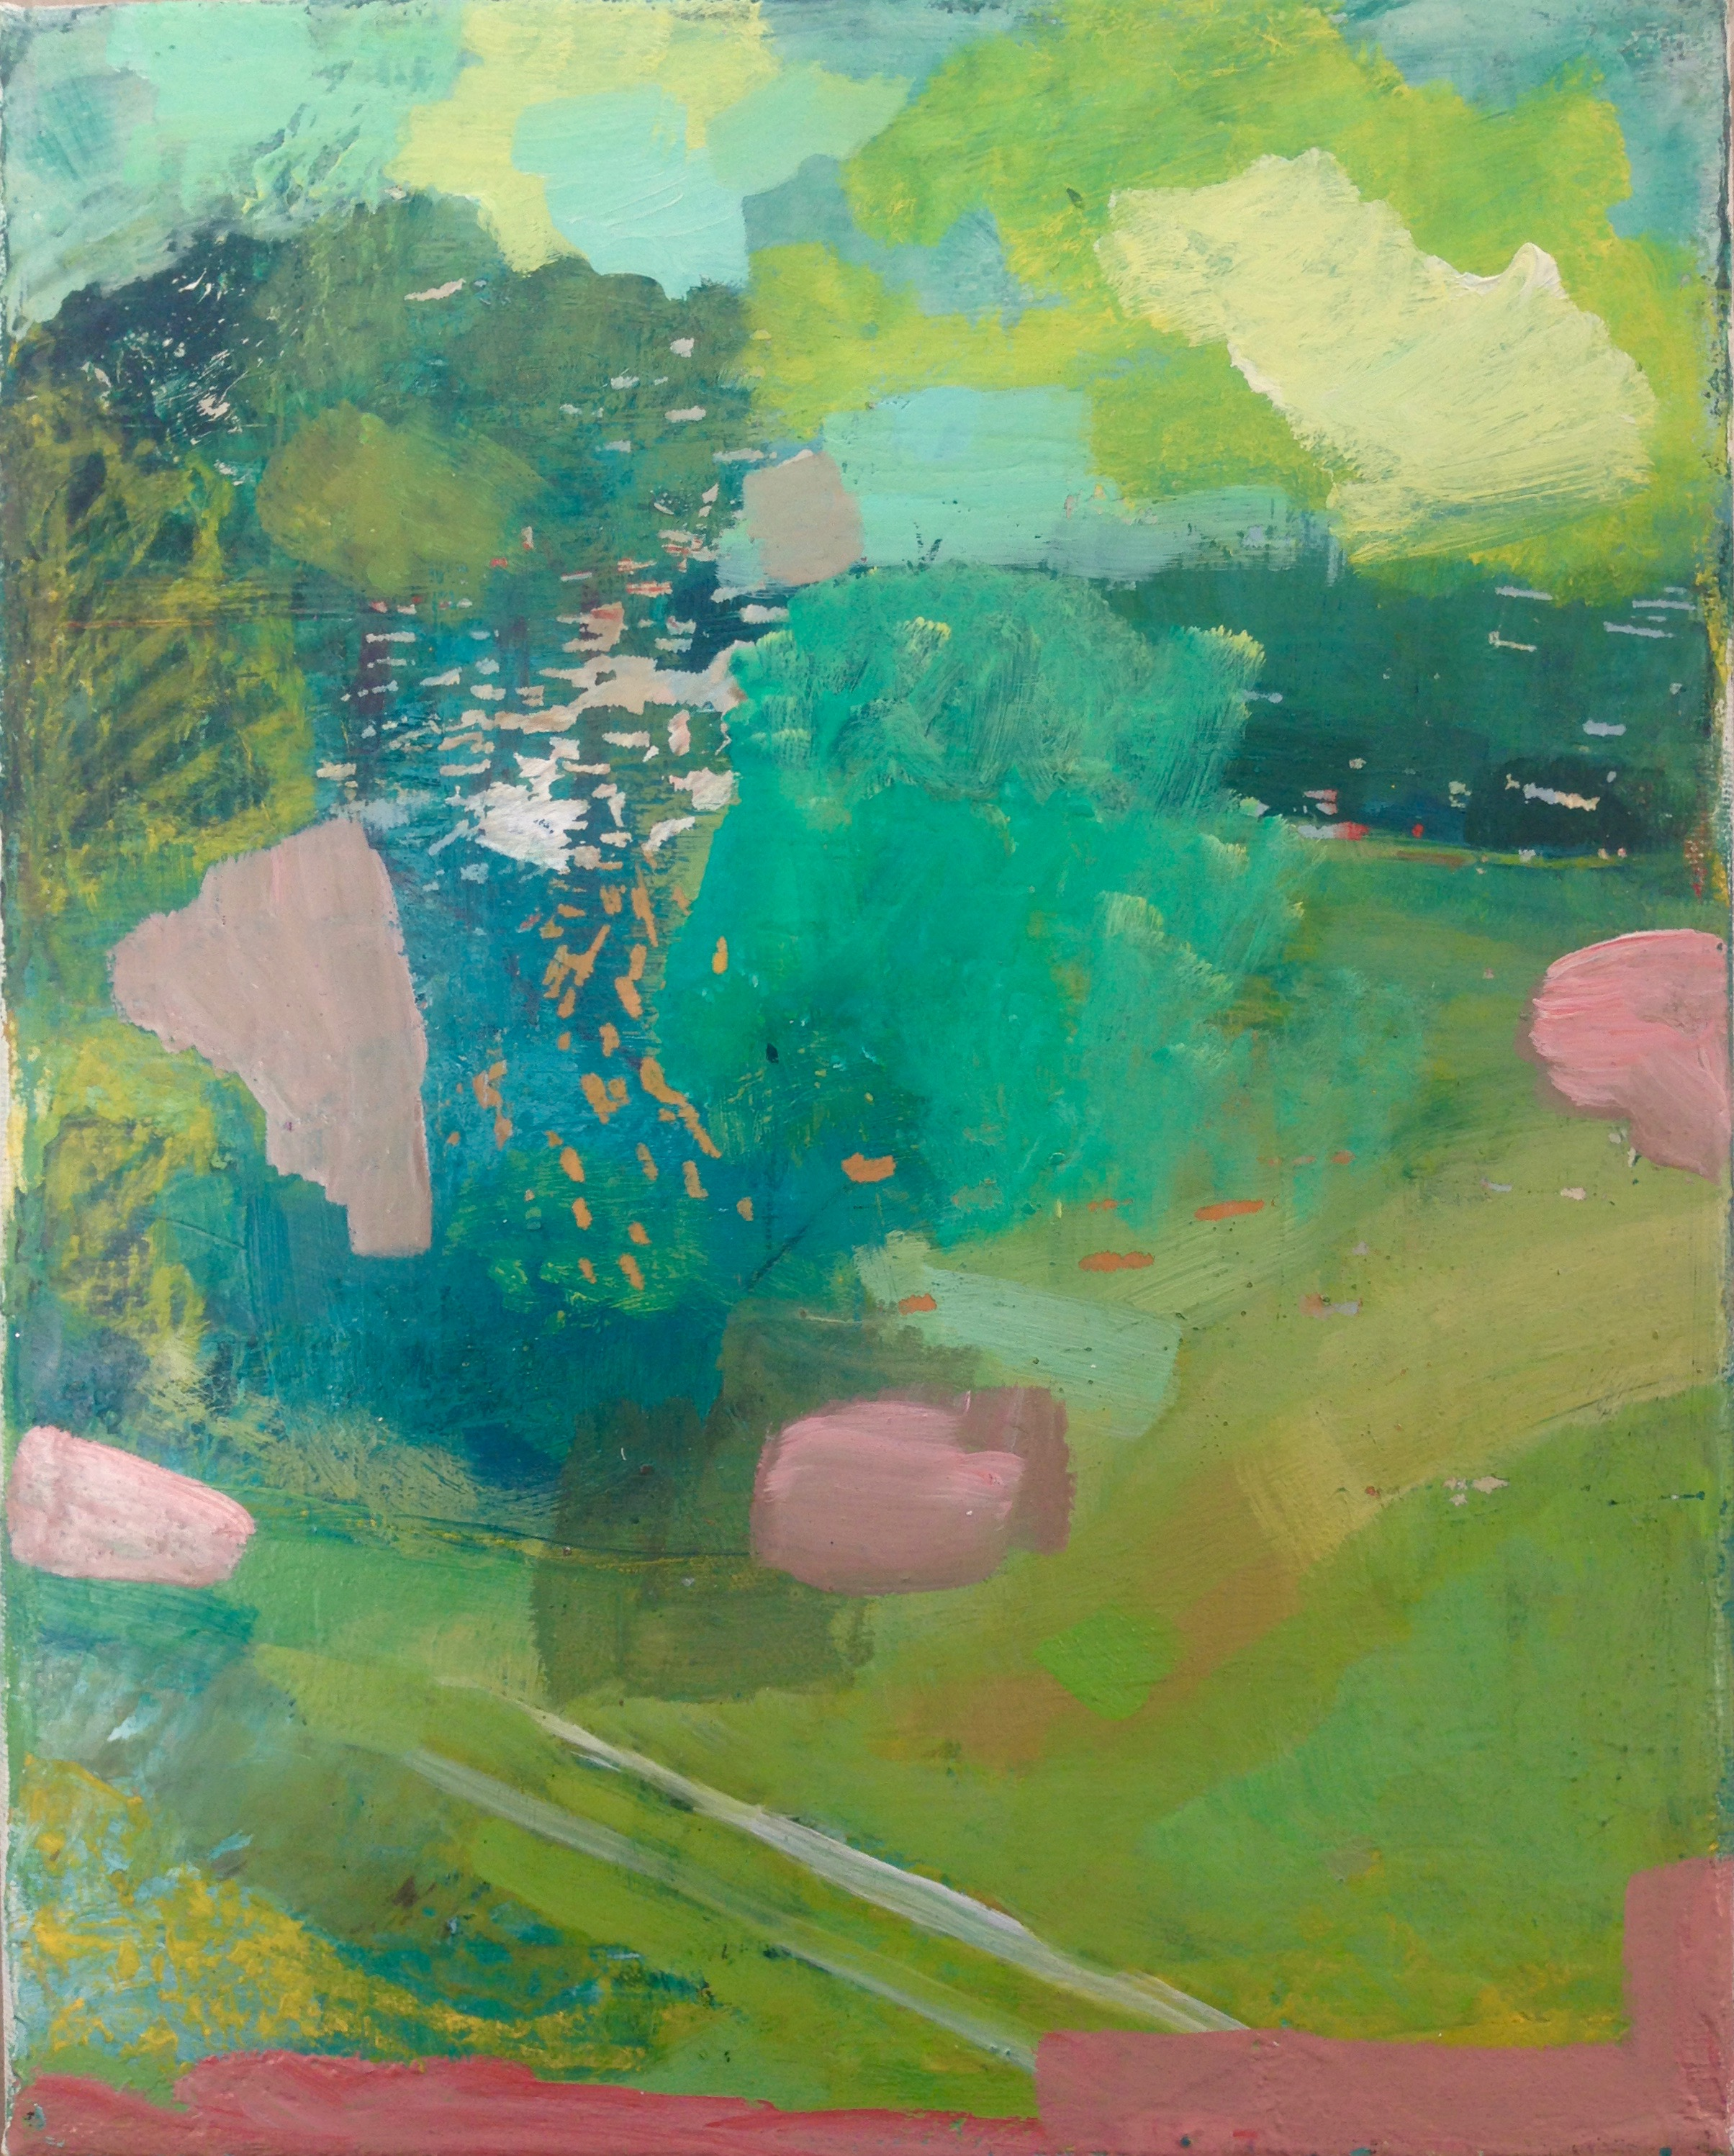 "sl9, 2017, oil on canvas, 10"" x 8"""